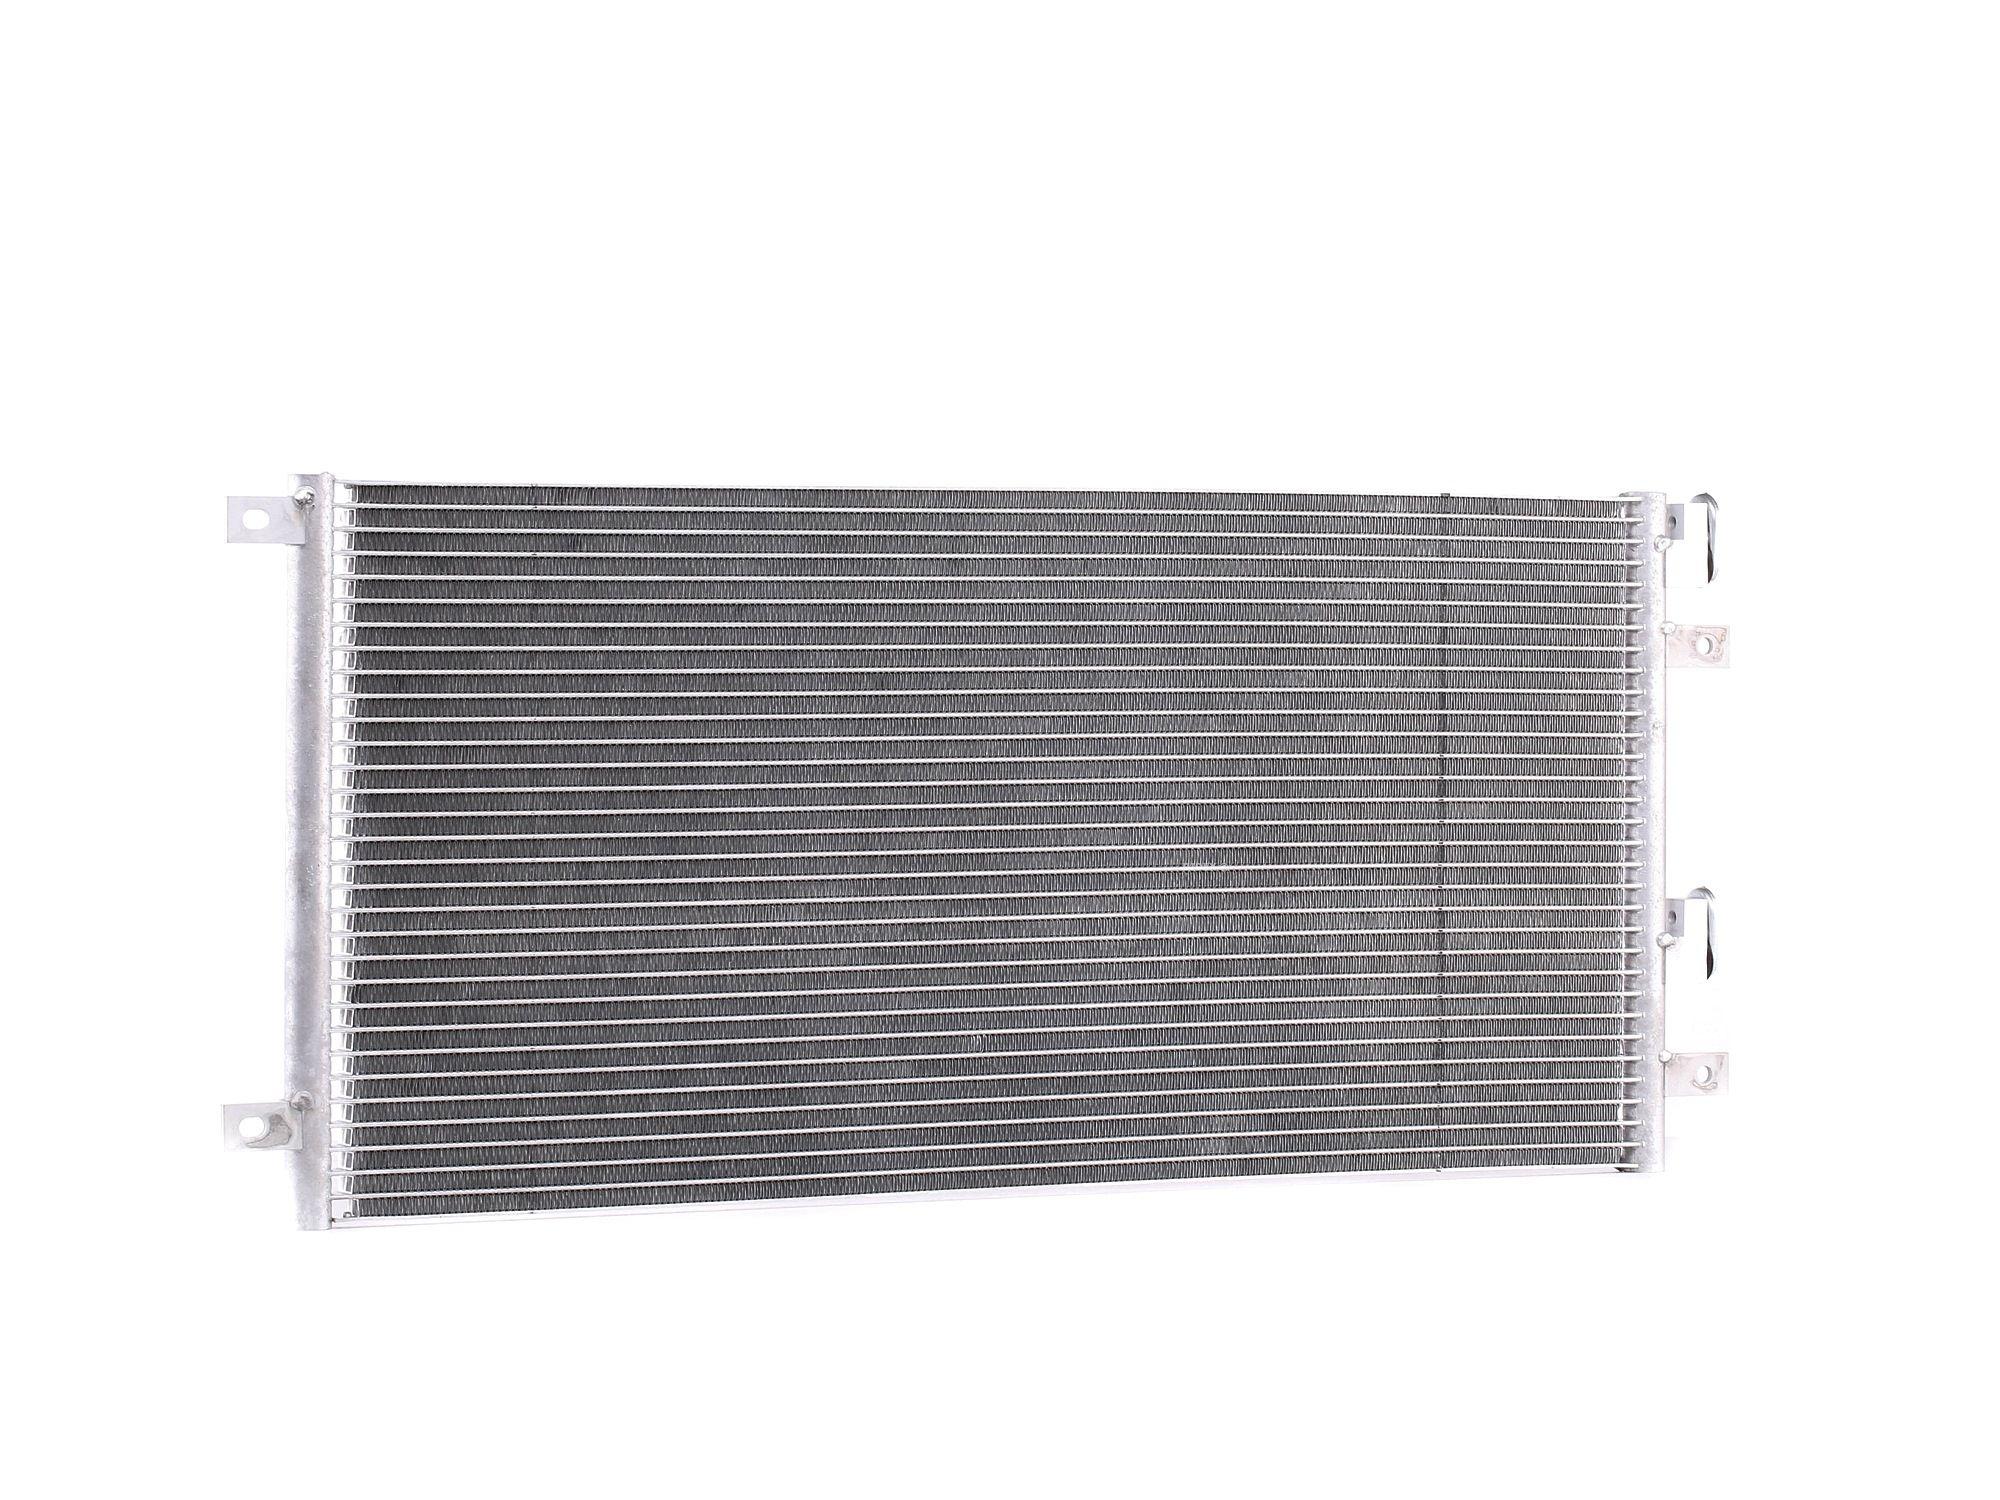 ridex Condensor Airco IVECO 448C0275 504022601 Airco Radiator,Condensator, airconditioning